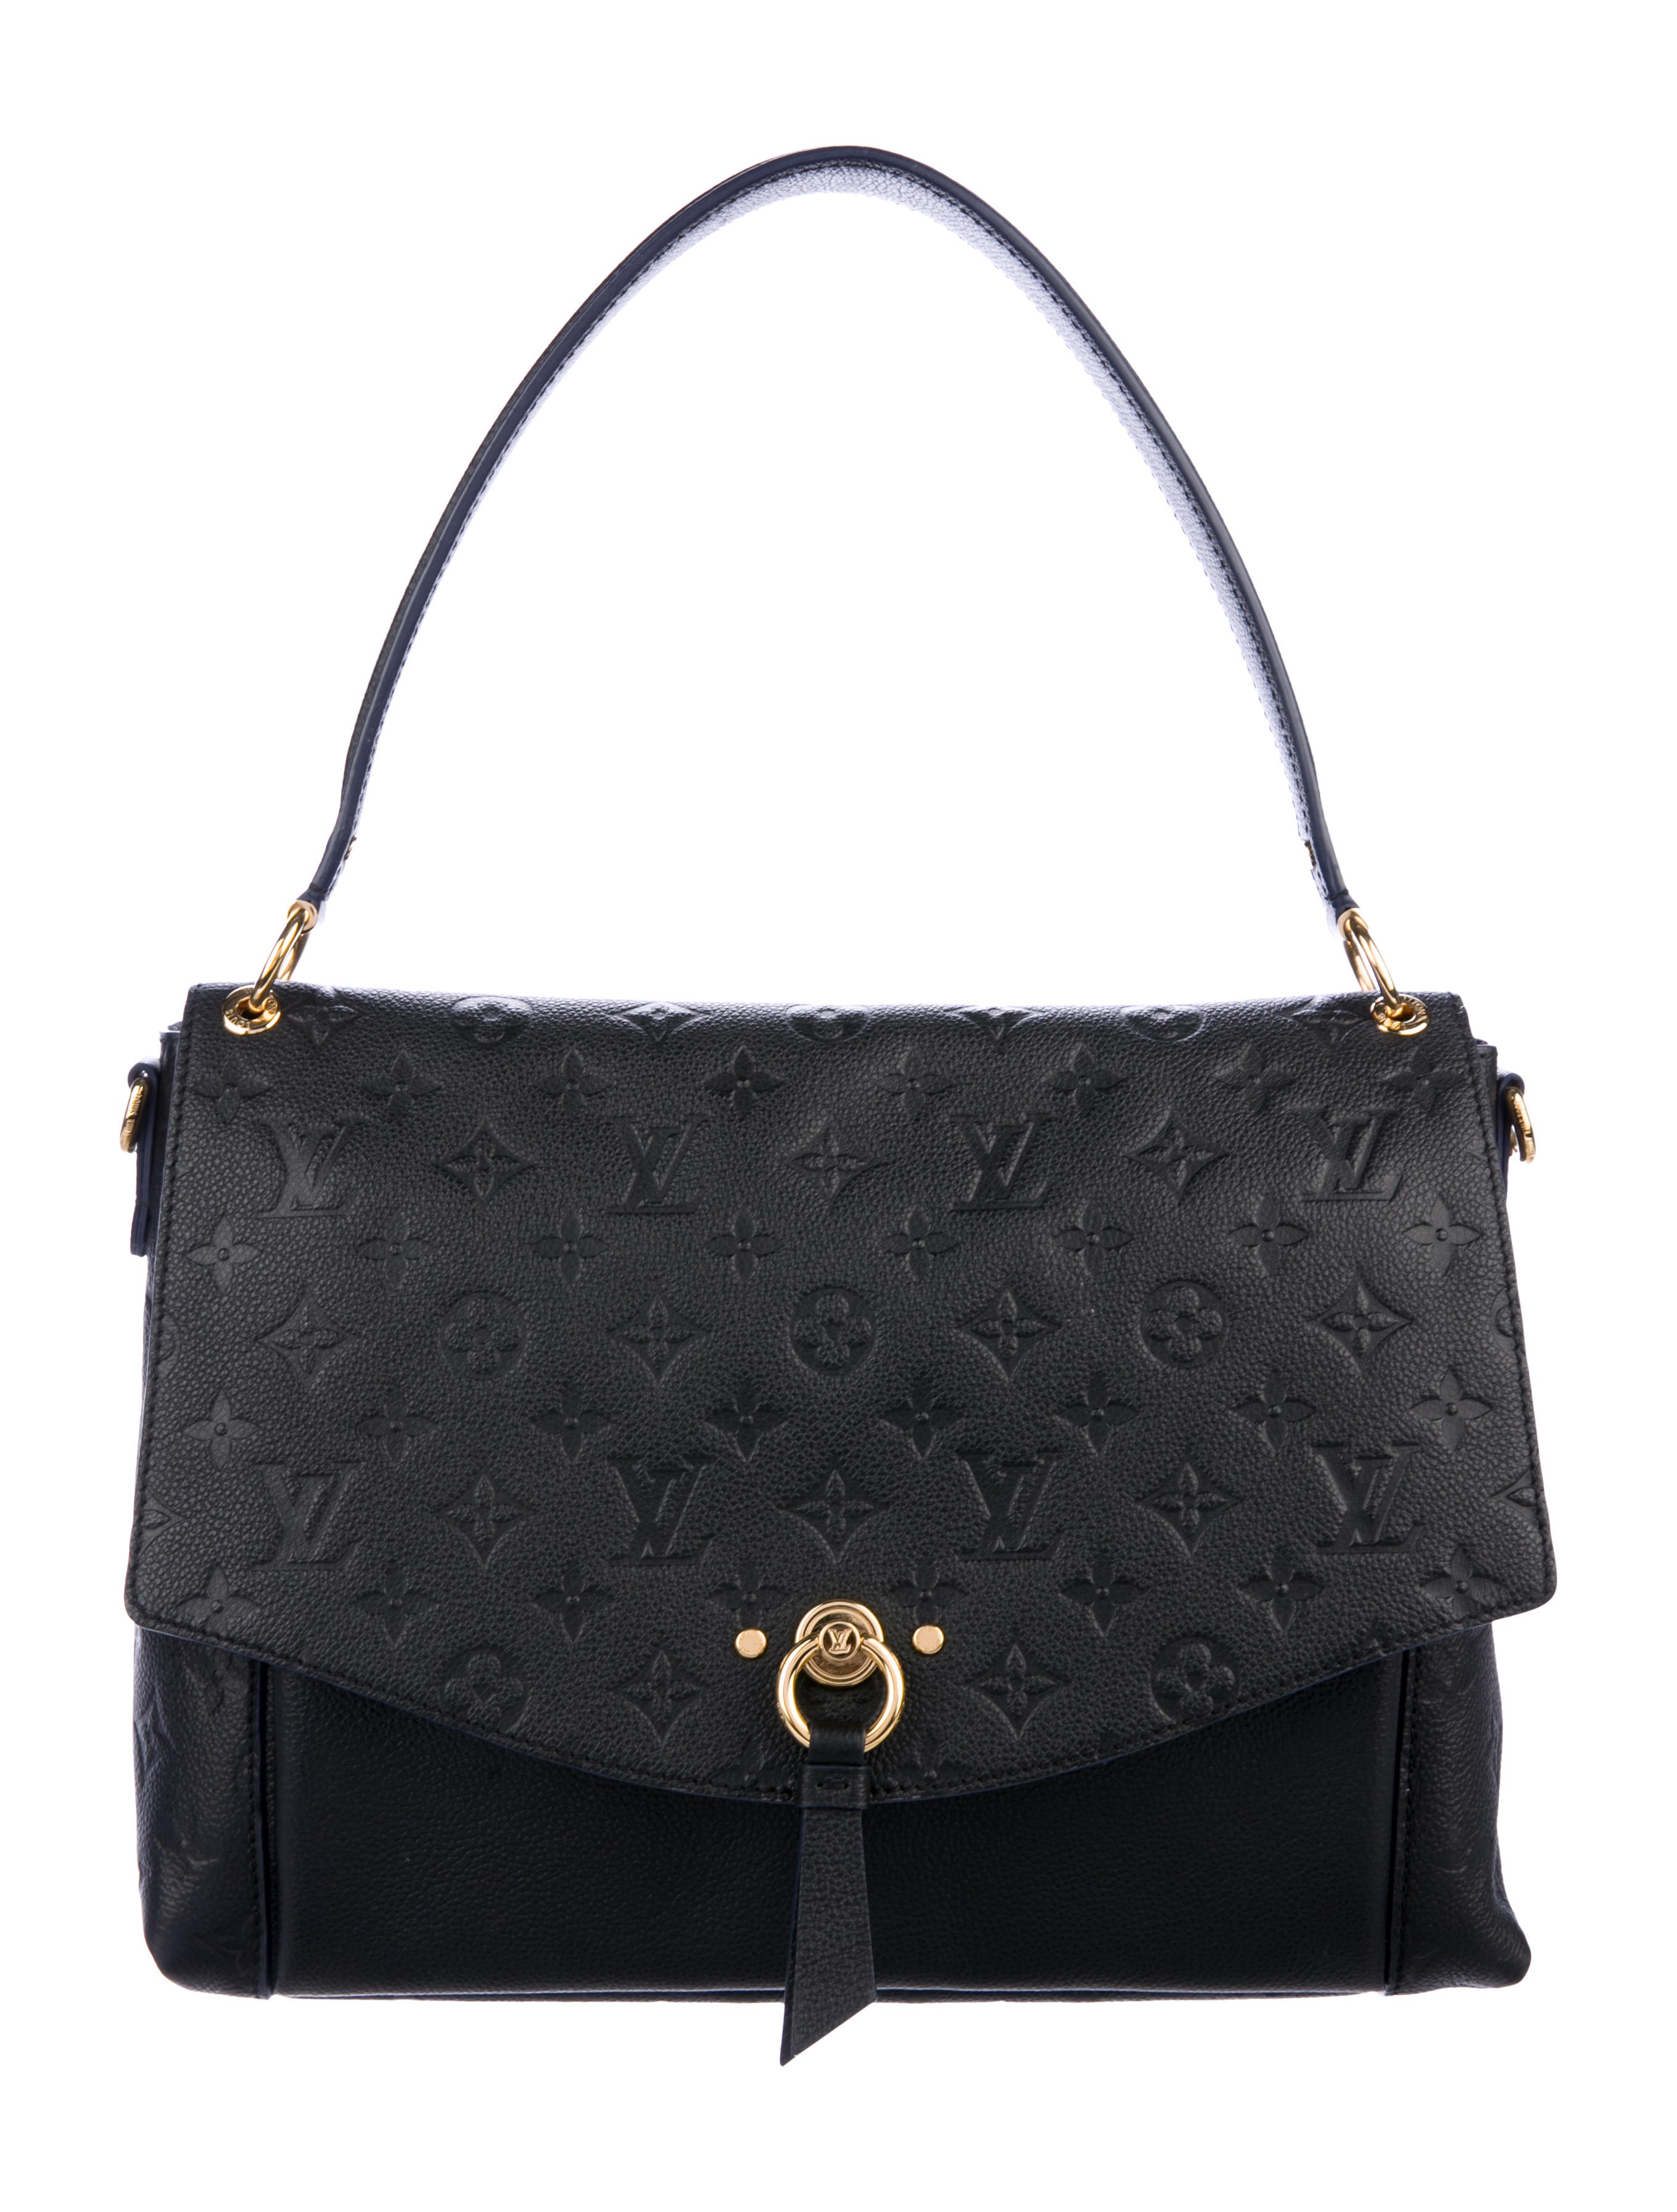 81eece15d87d Louis Vuitton 2018 Blanche MM - Handbags - LOU180292